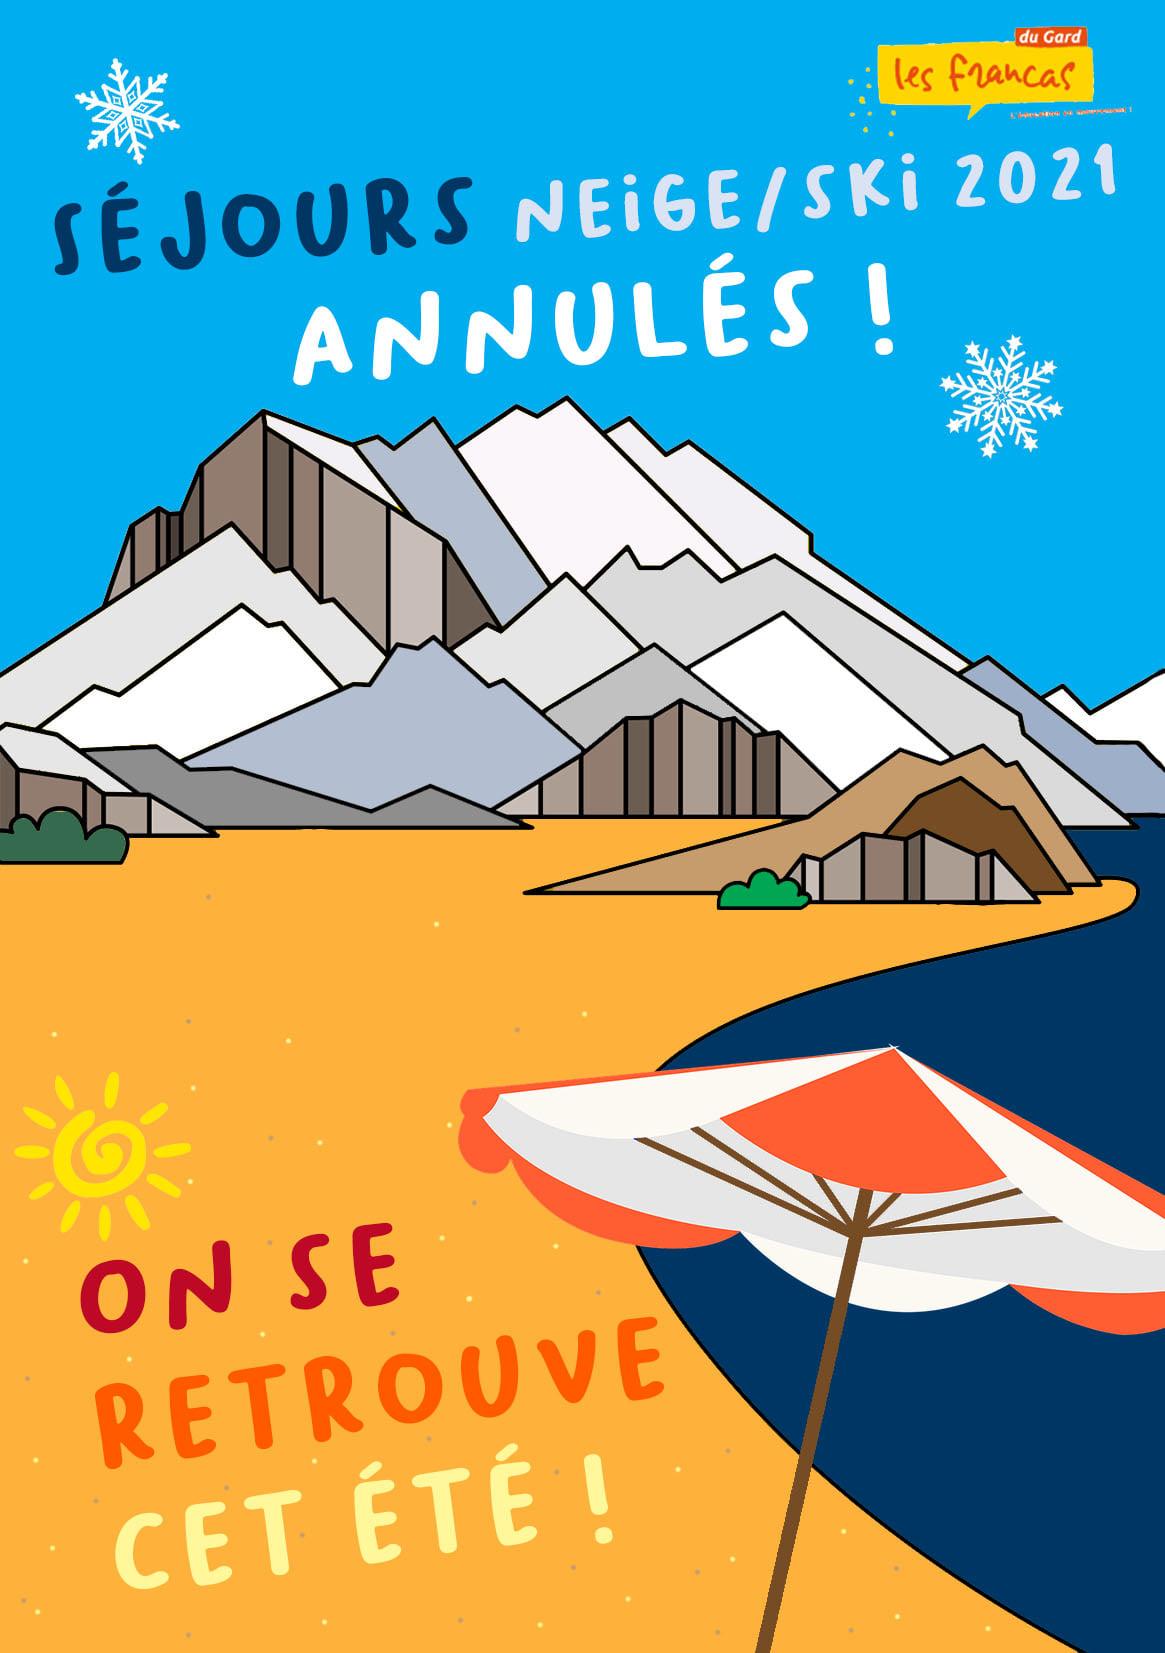 Annulation des séjours Neige et Ski 2020